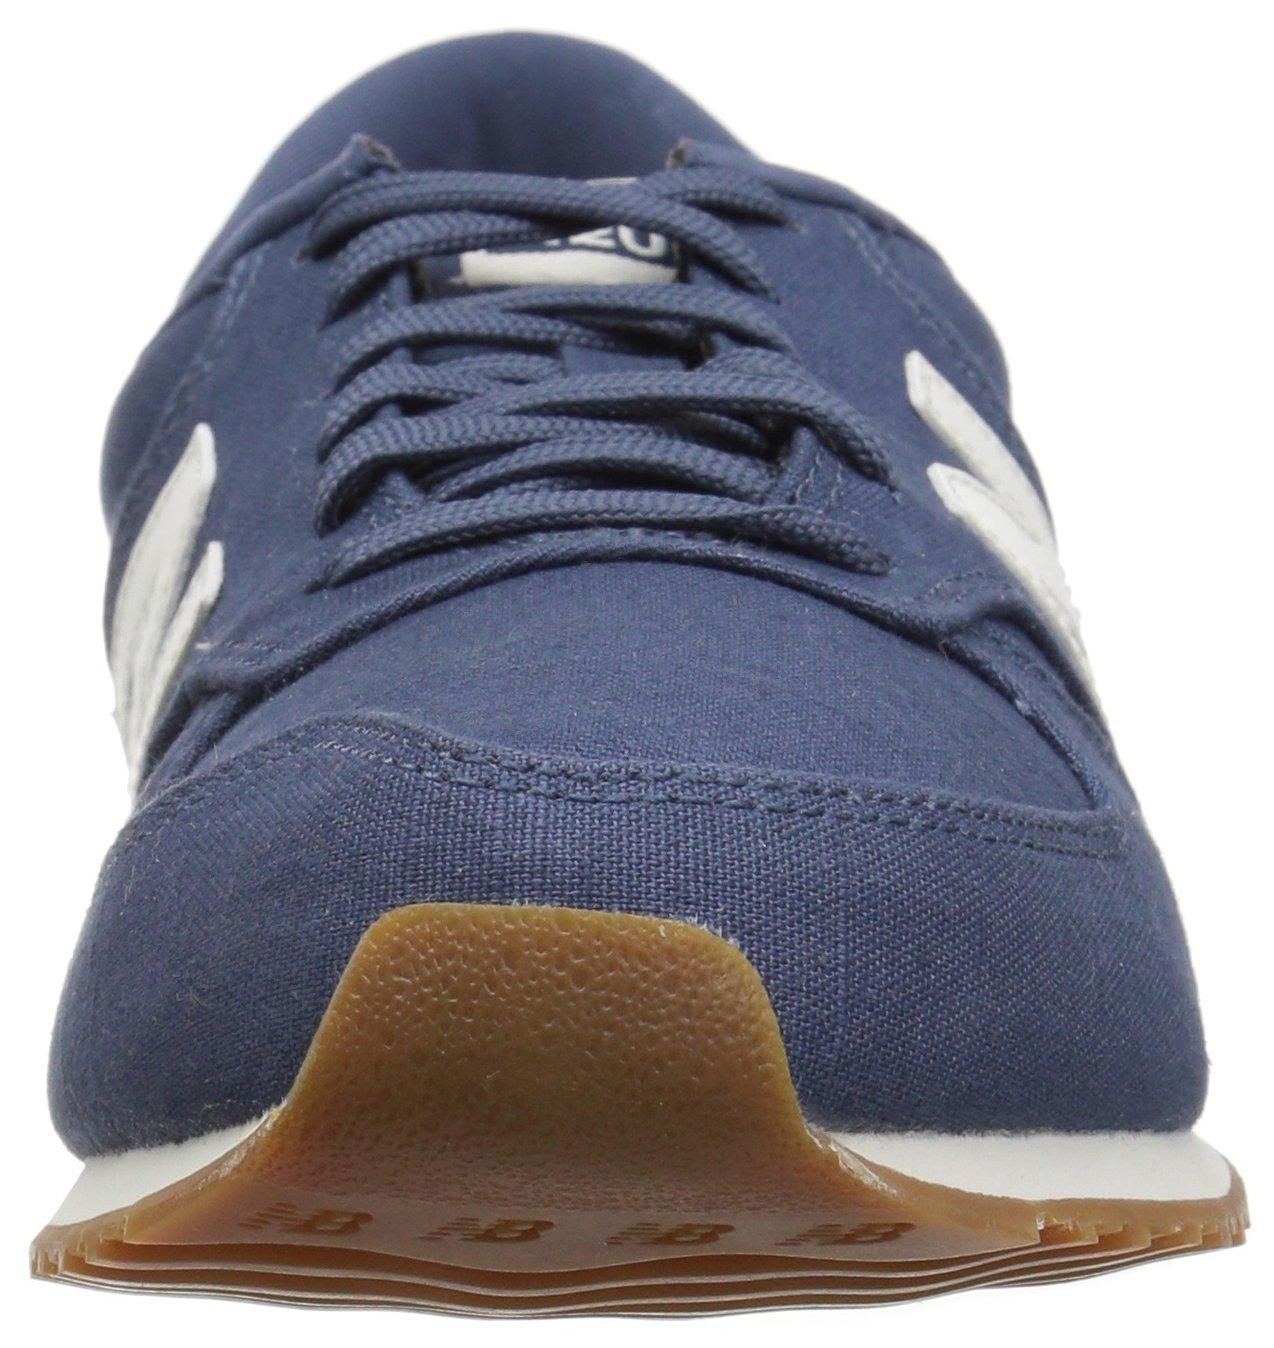 New Balance Damen Vintage 420v1 Sneaker, Vintage Damen Indigo/Sea Salt 787c70